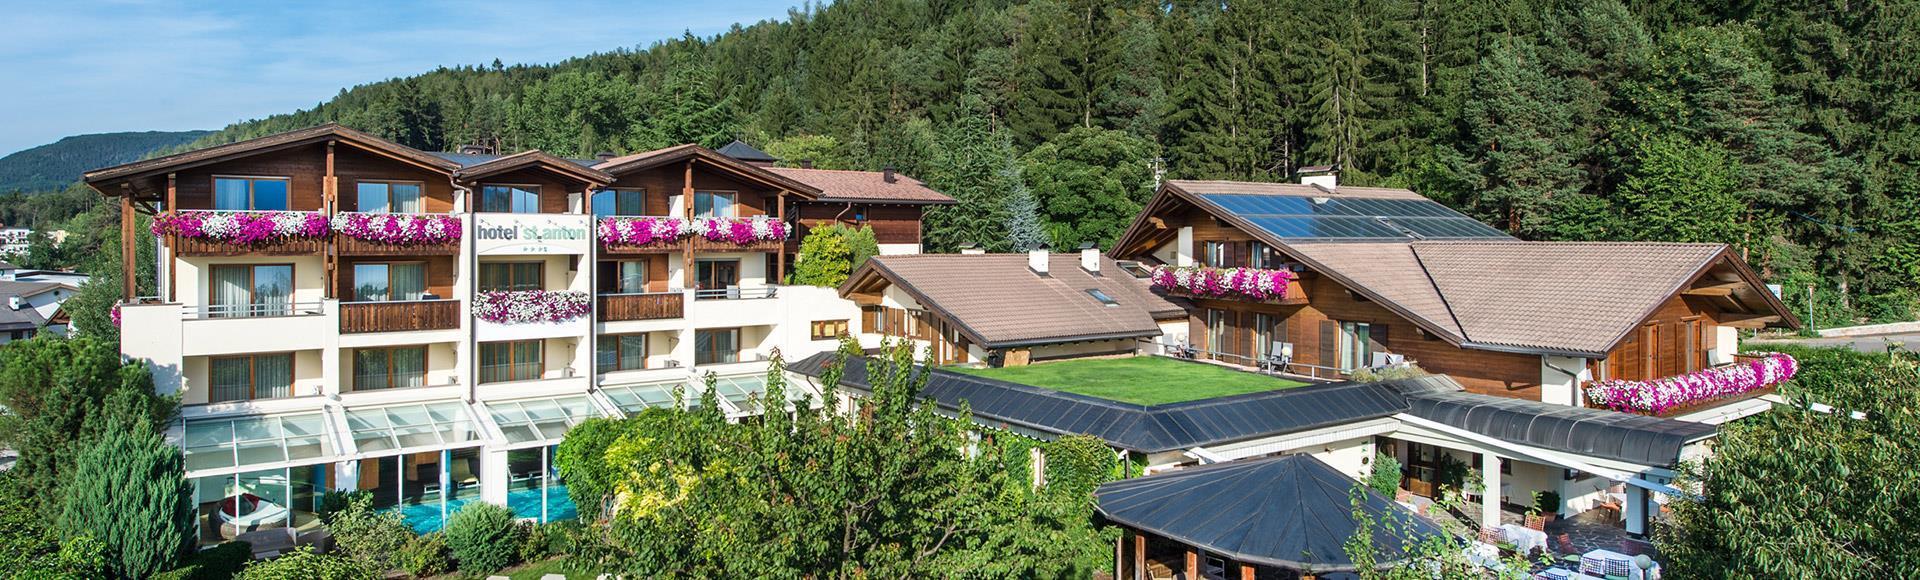 Hotel Edelweiss St Anton